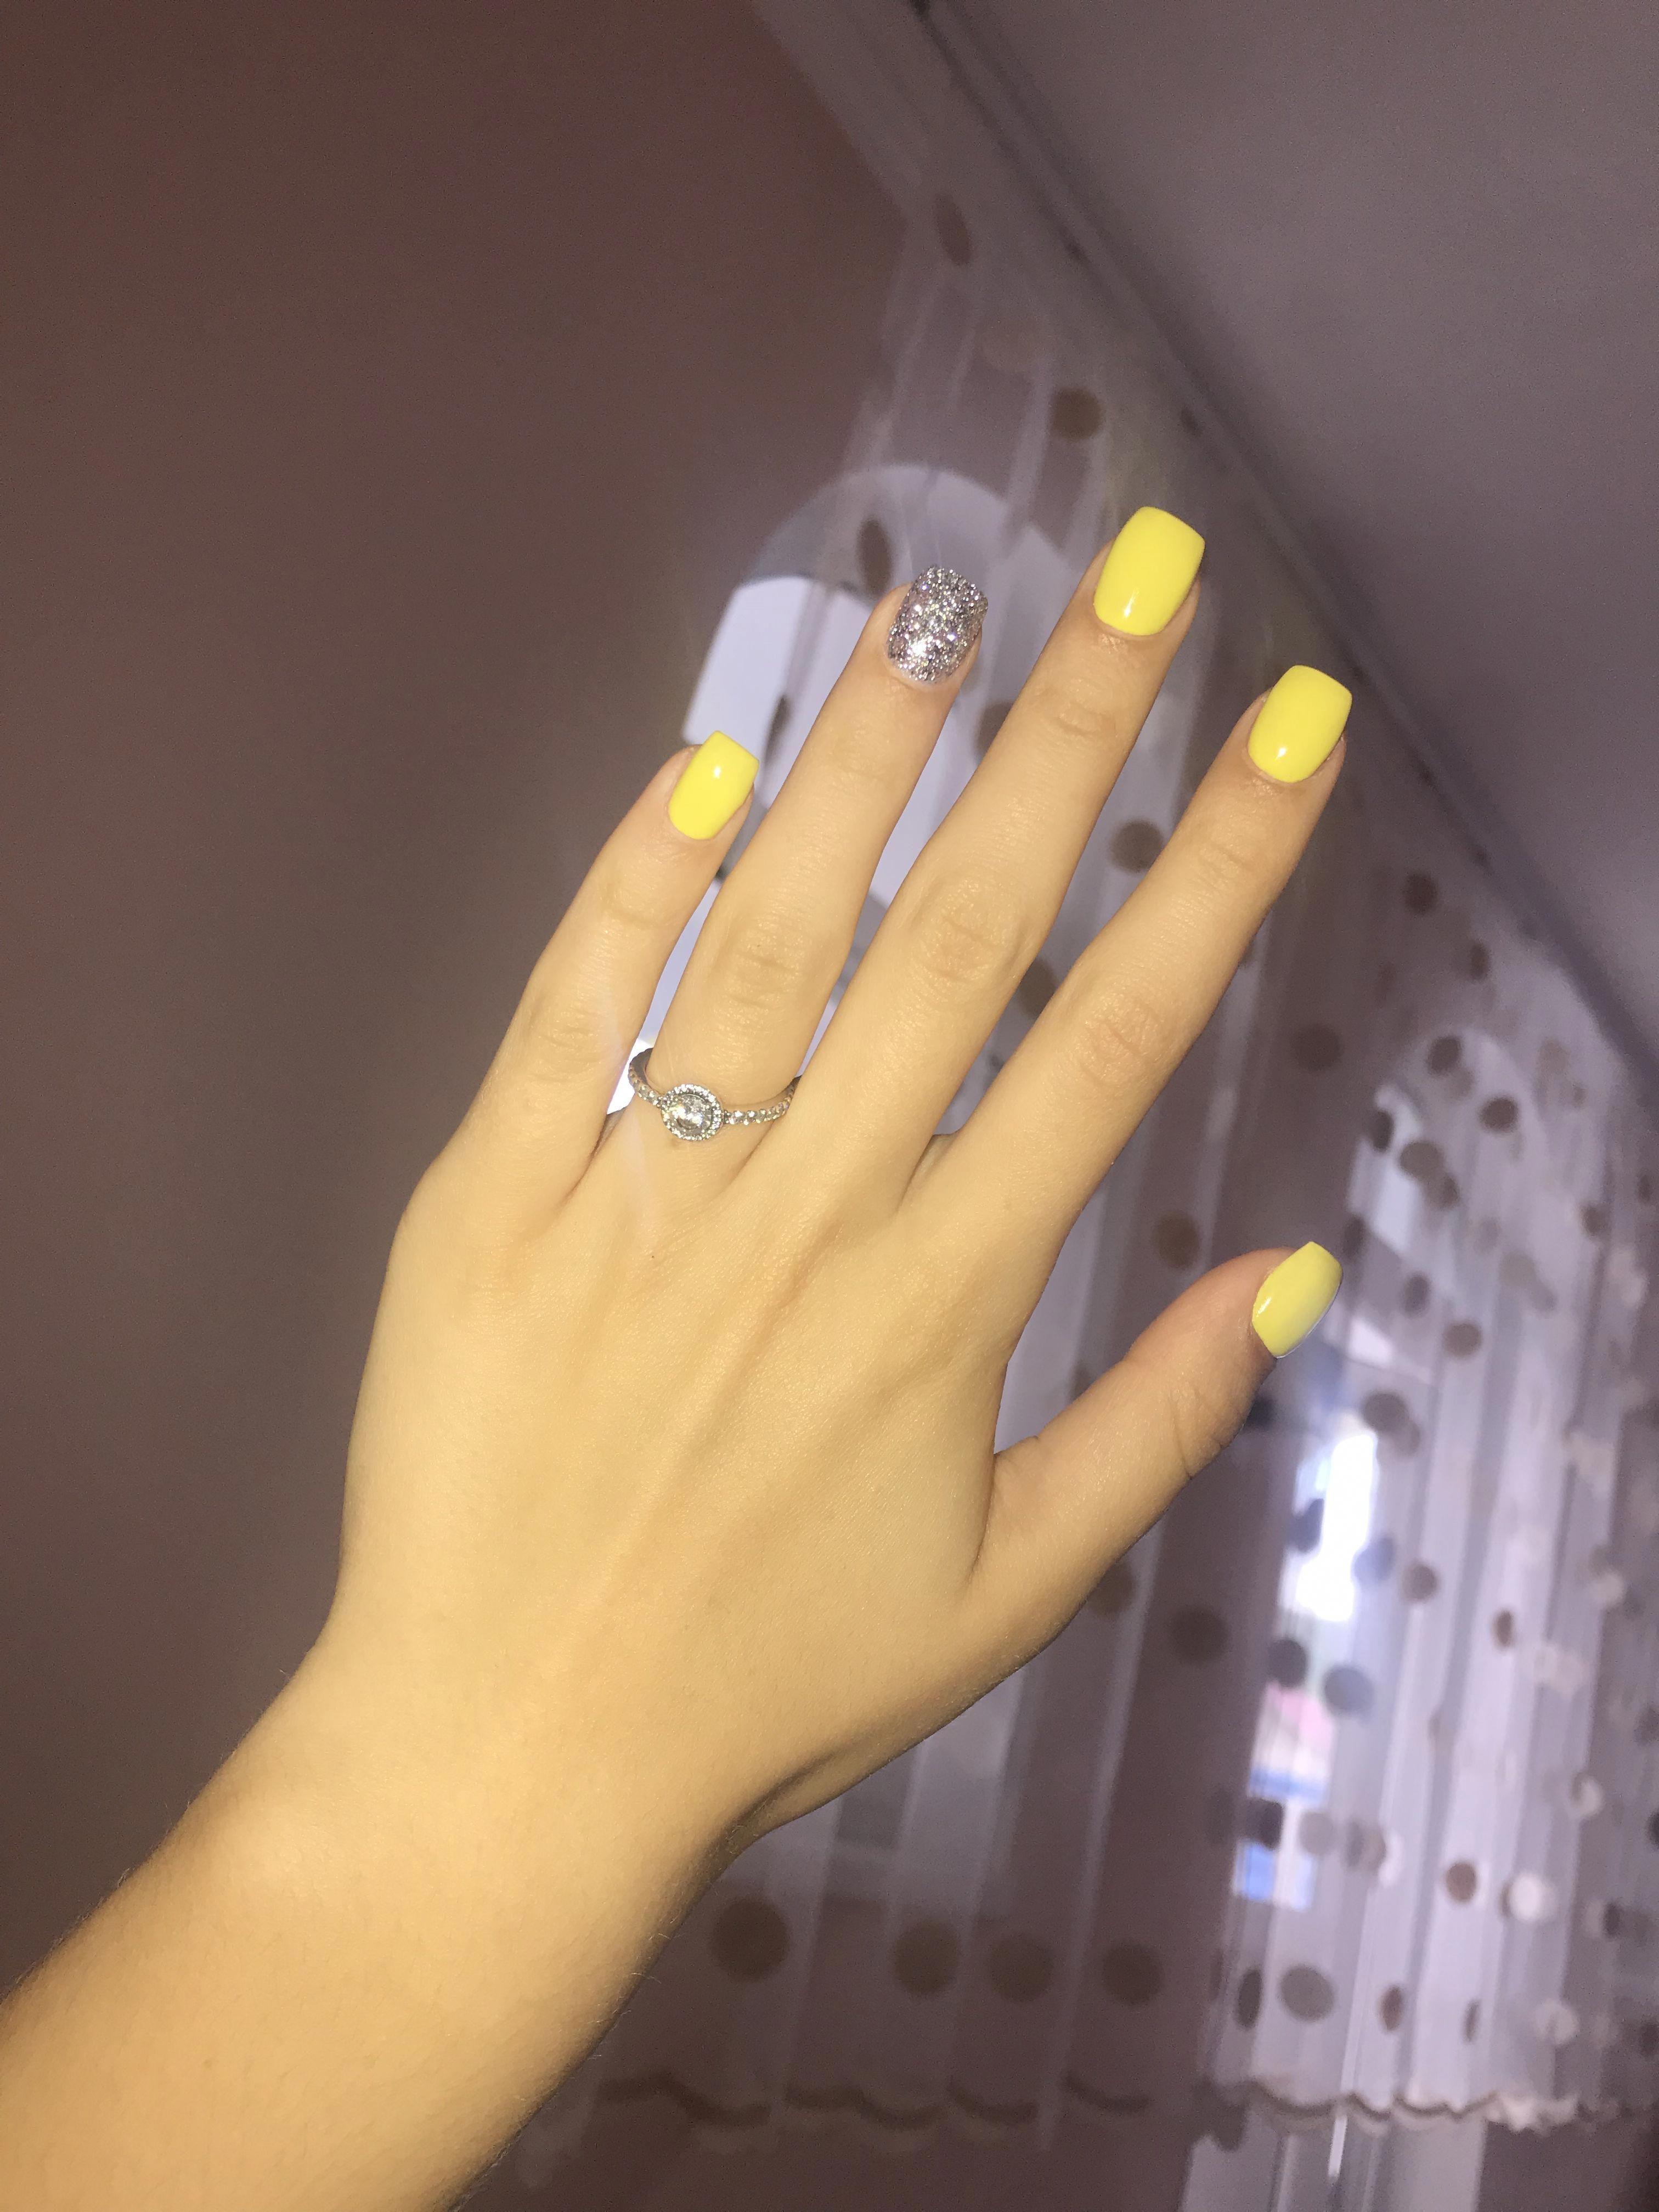 #beautifulacrylicnails | Square acrylic nails, Yellow ...